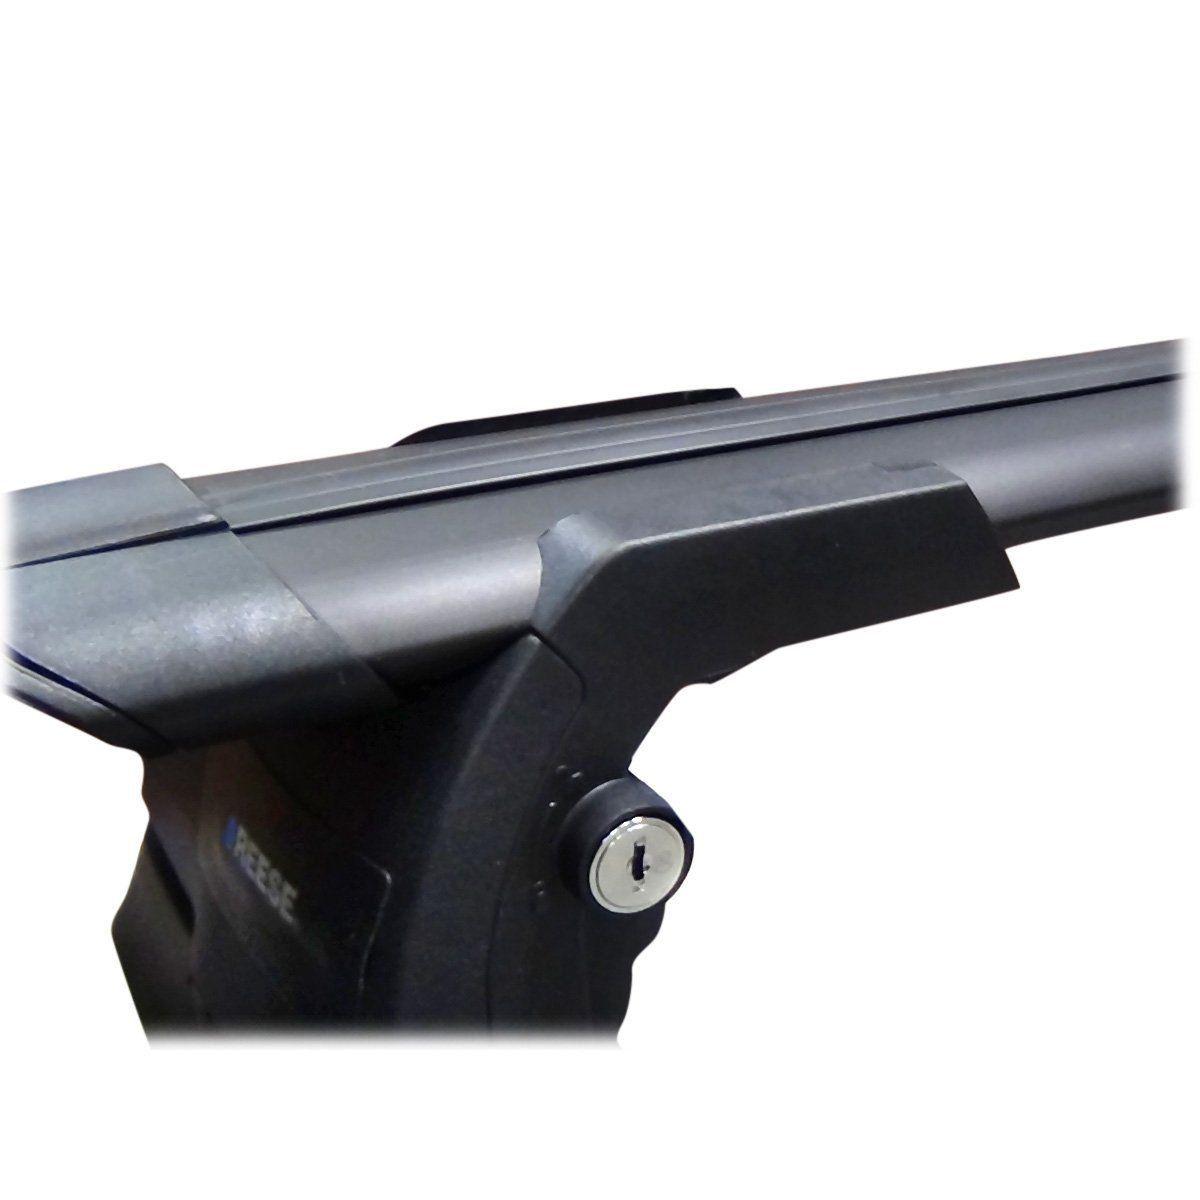 Rack de Teto Bagageiro Para L200 Triton Preto Reese Premium